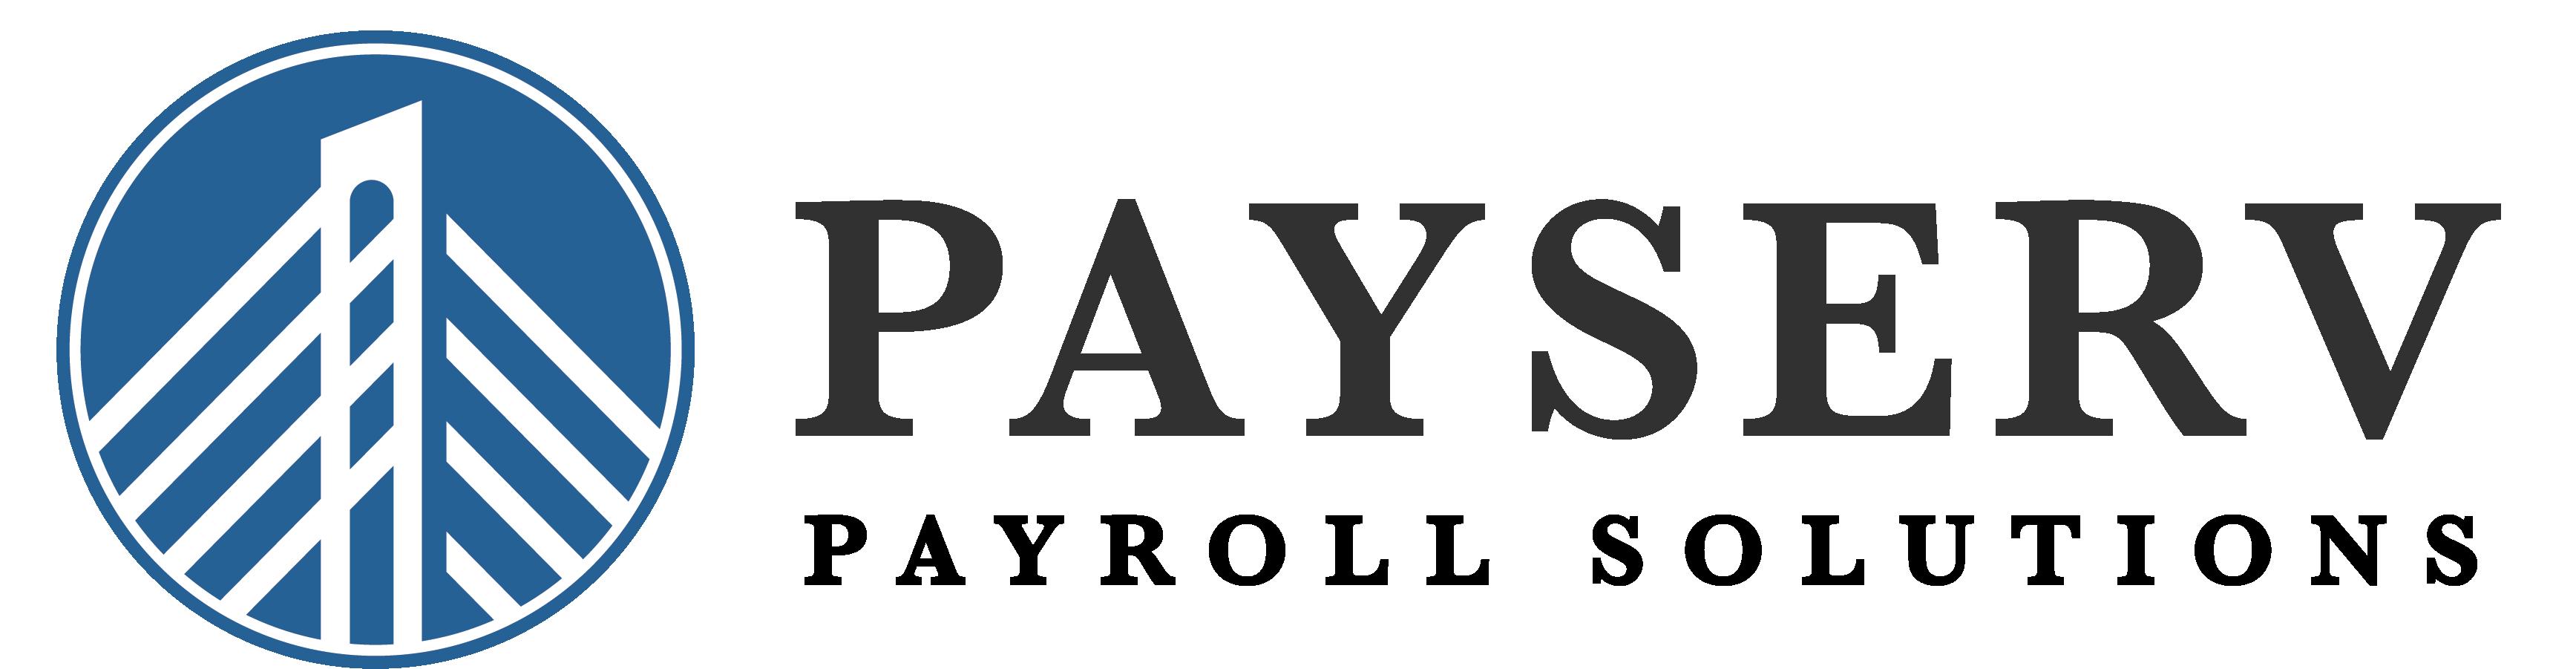 PayServ